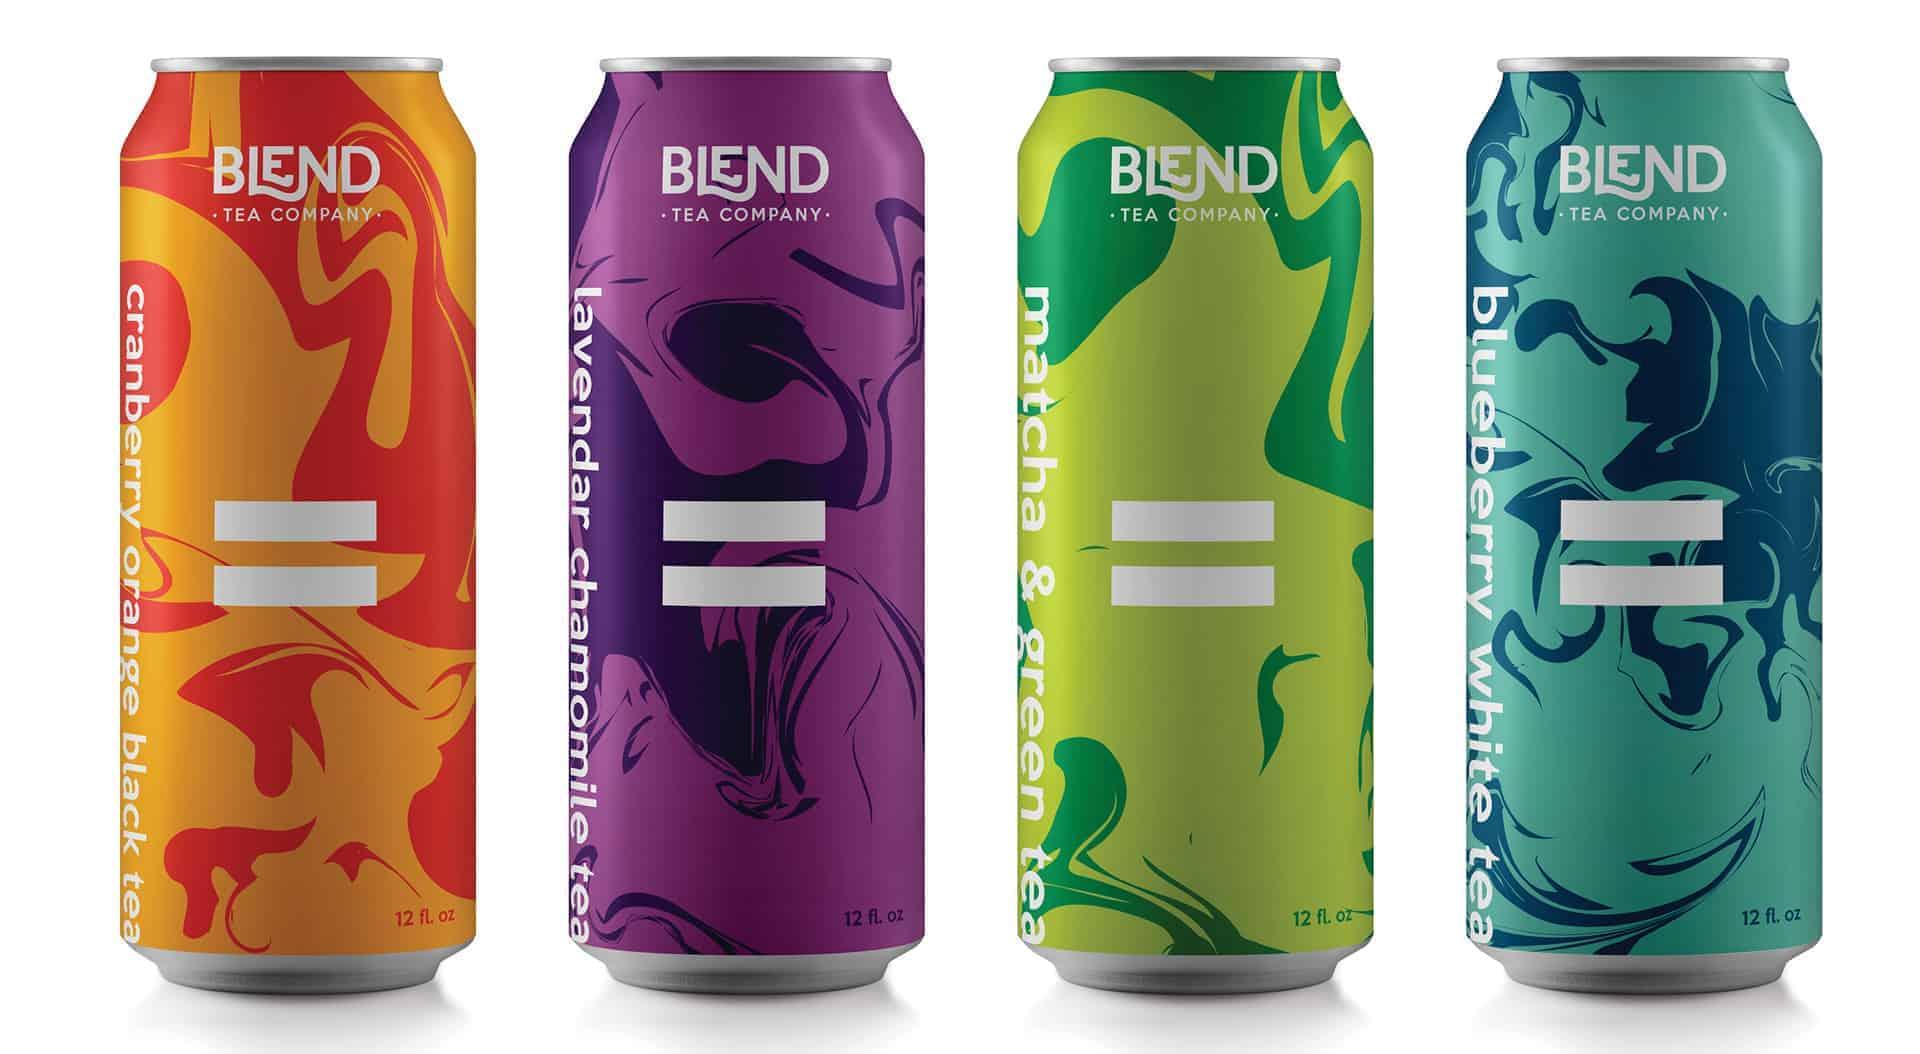 Blend Tea Company